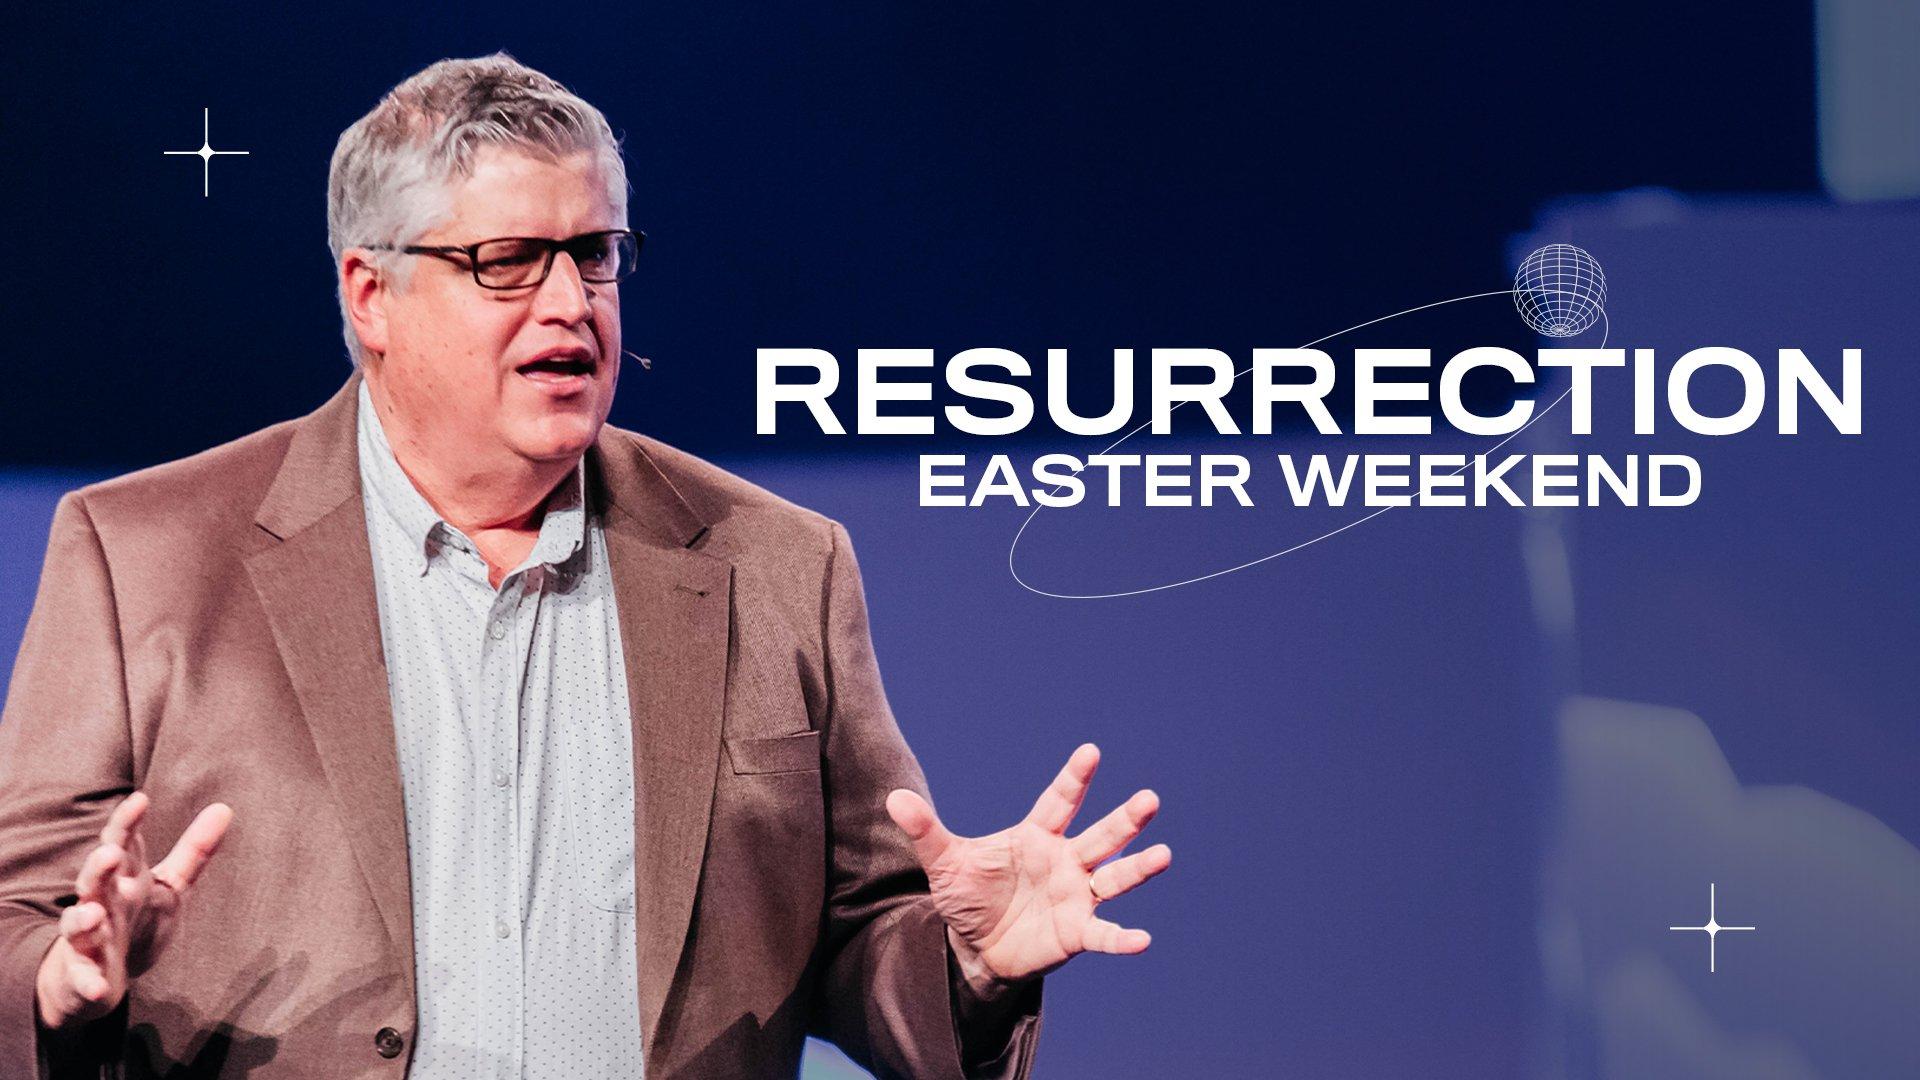 Resurrection Easter Weekend